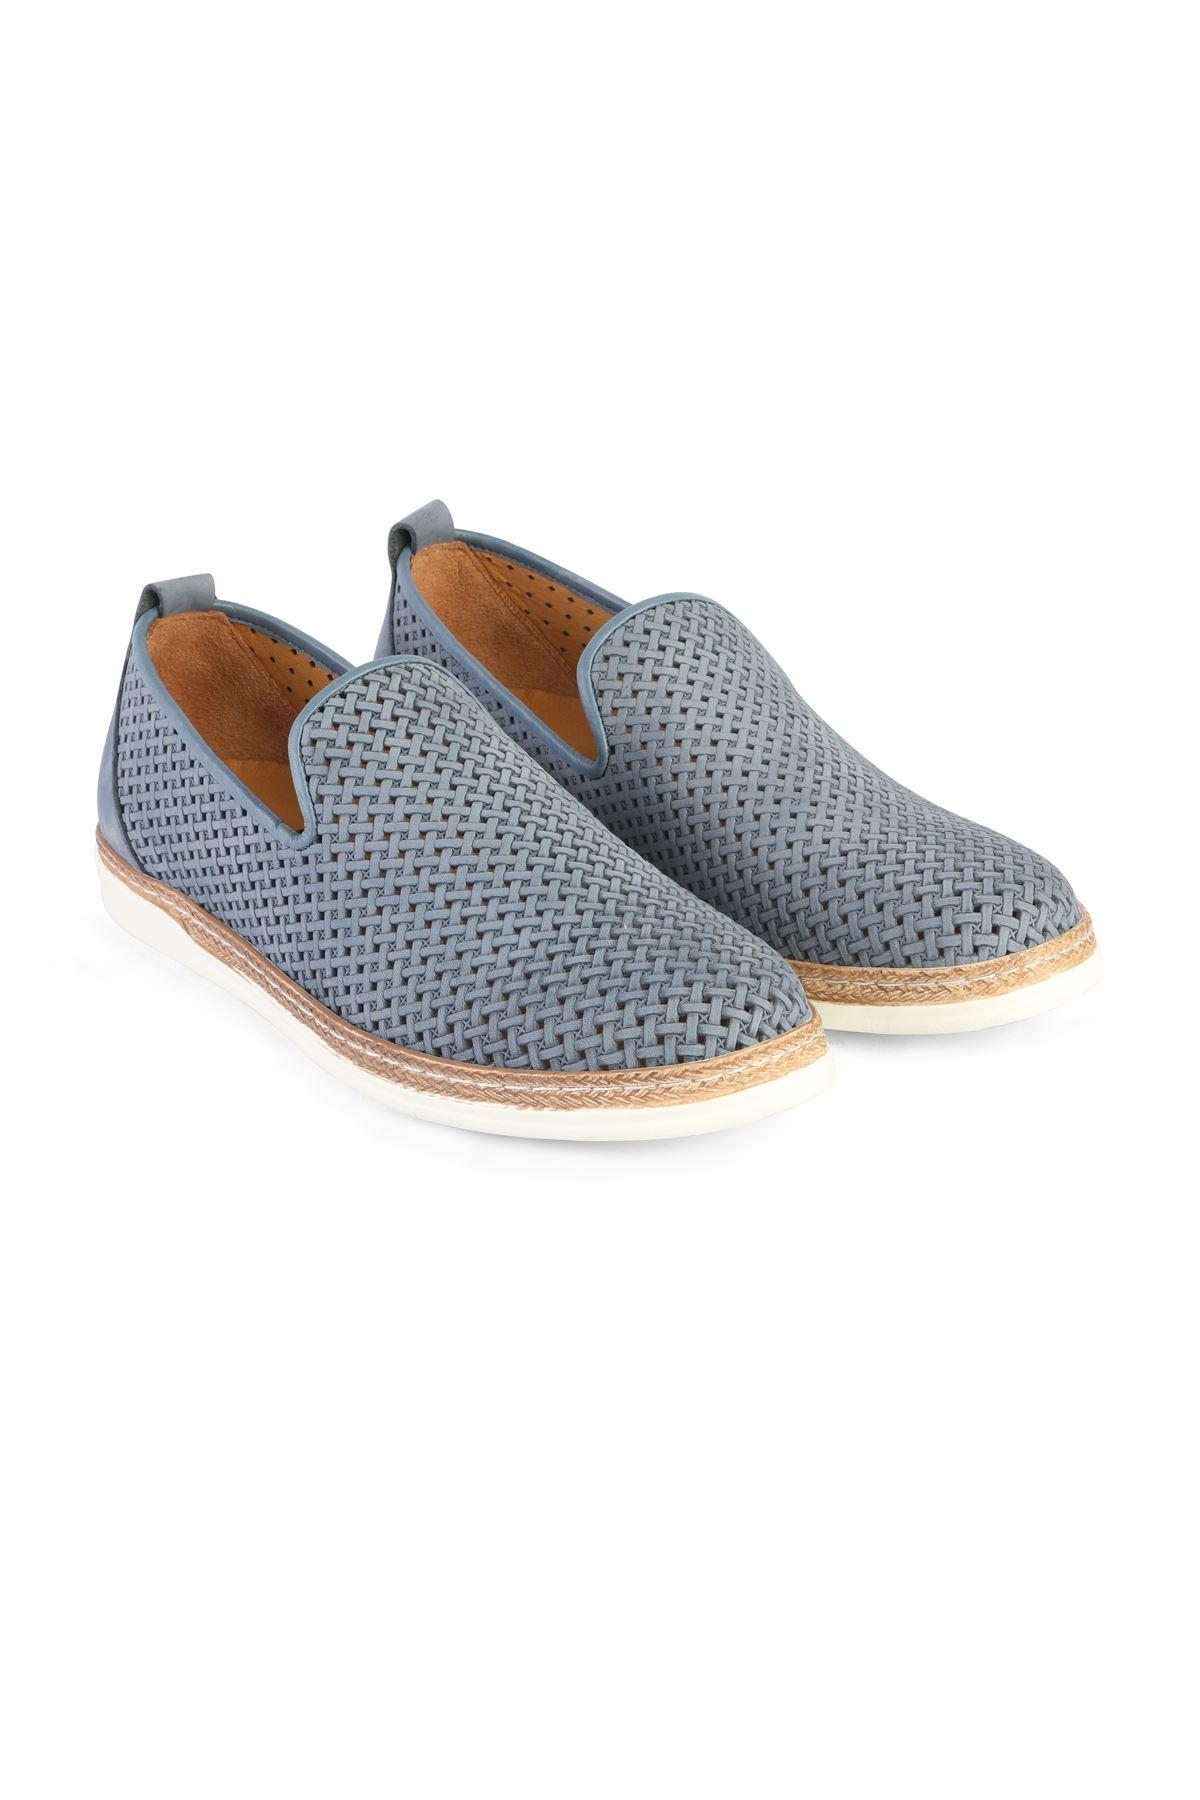 Libero 3397 Mavi Loafer Ayakkabı